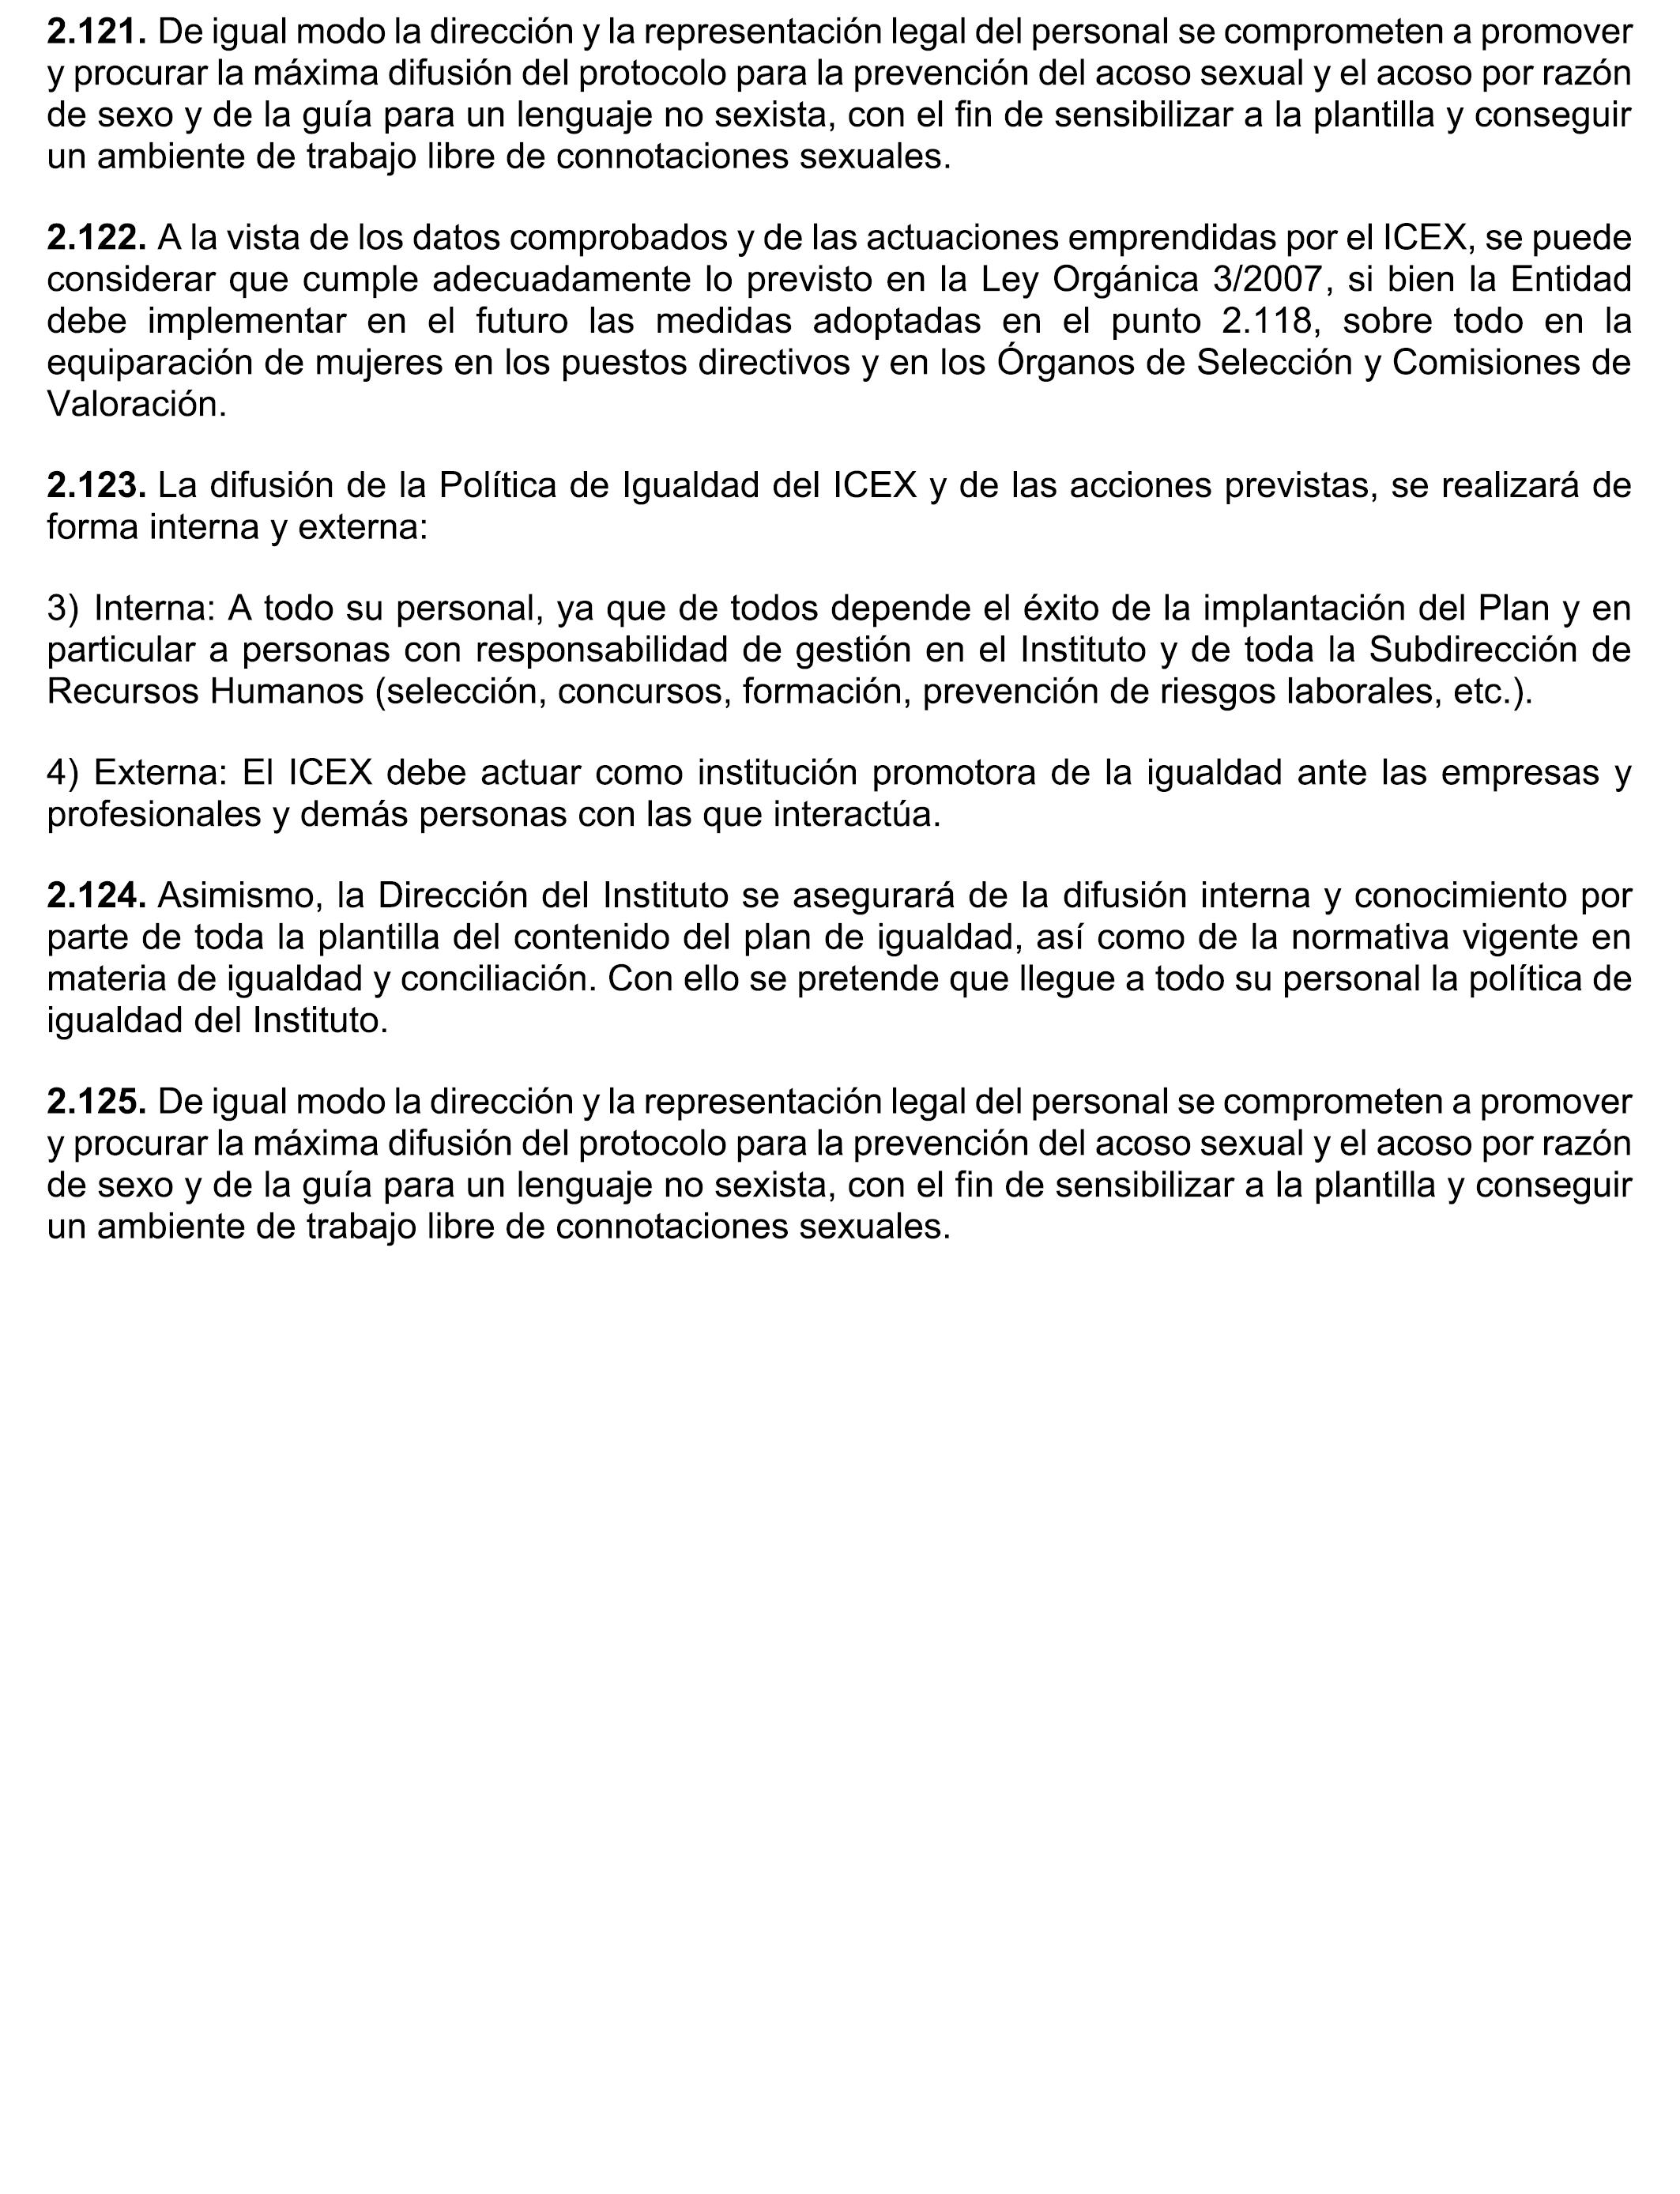 BOE.es - Documento BOE-A-2018-124